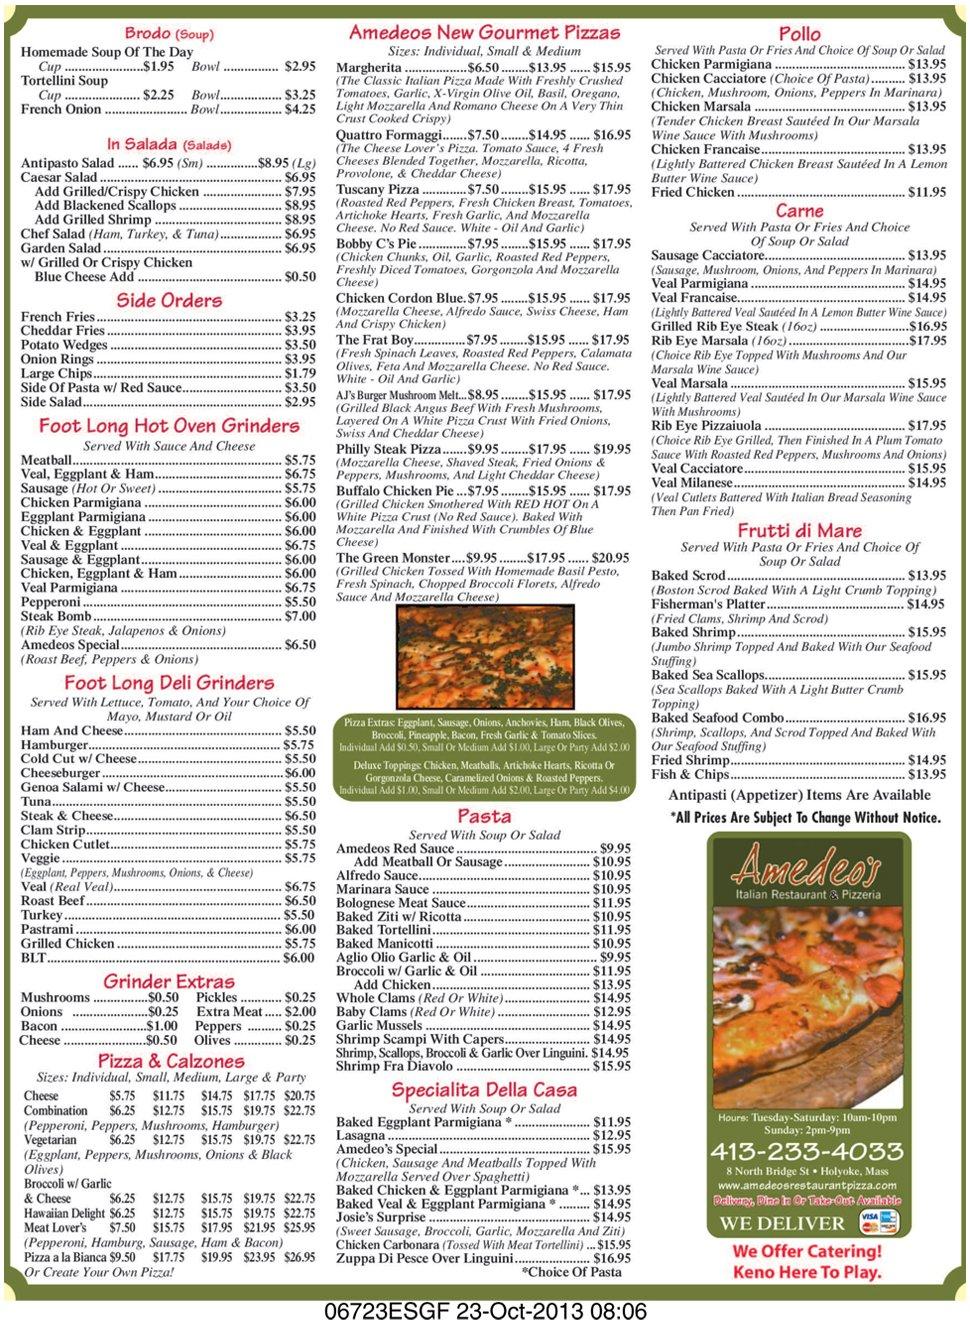 Amedeo's Restaurant & Pizza - Menu